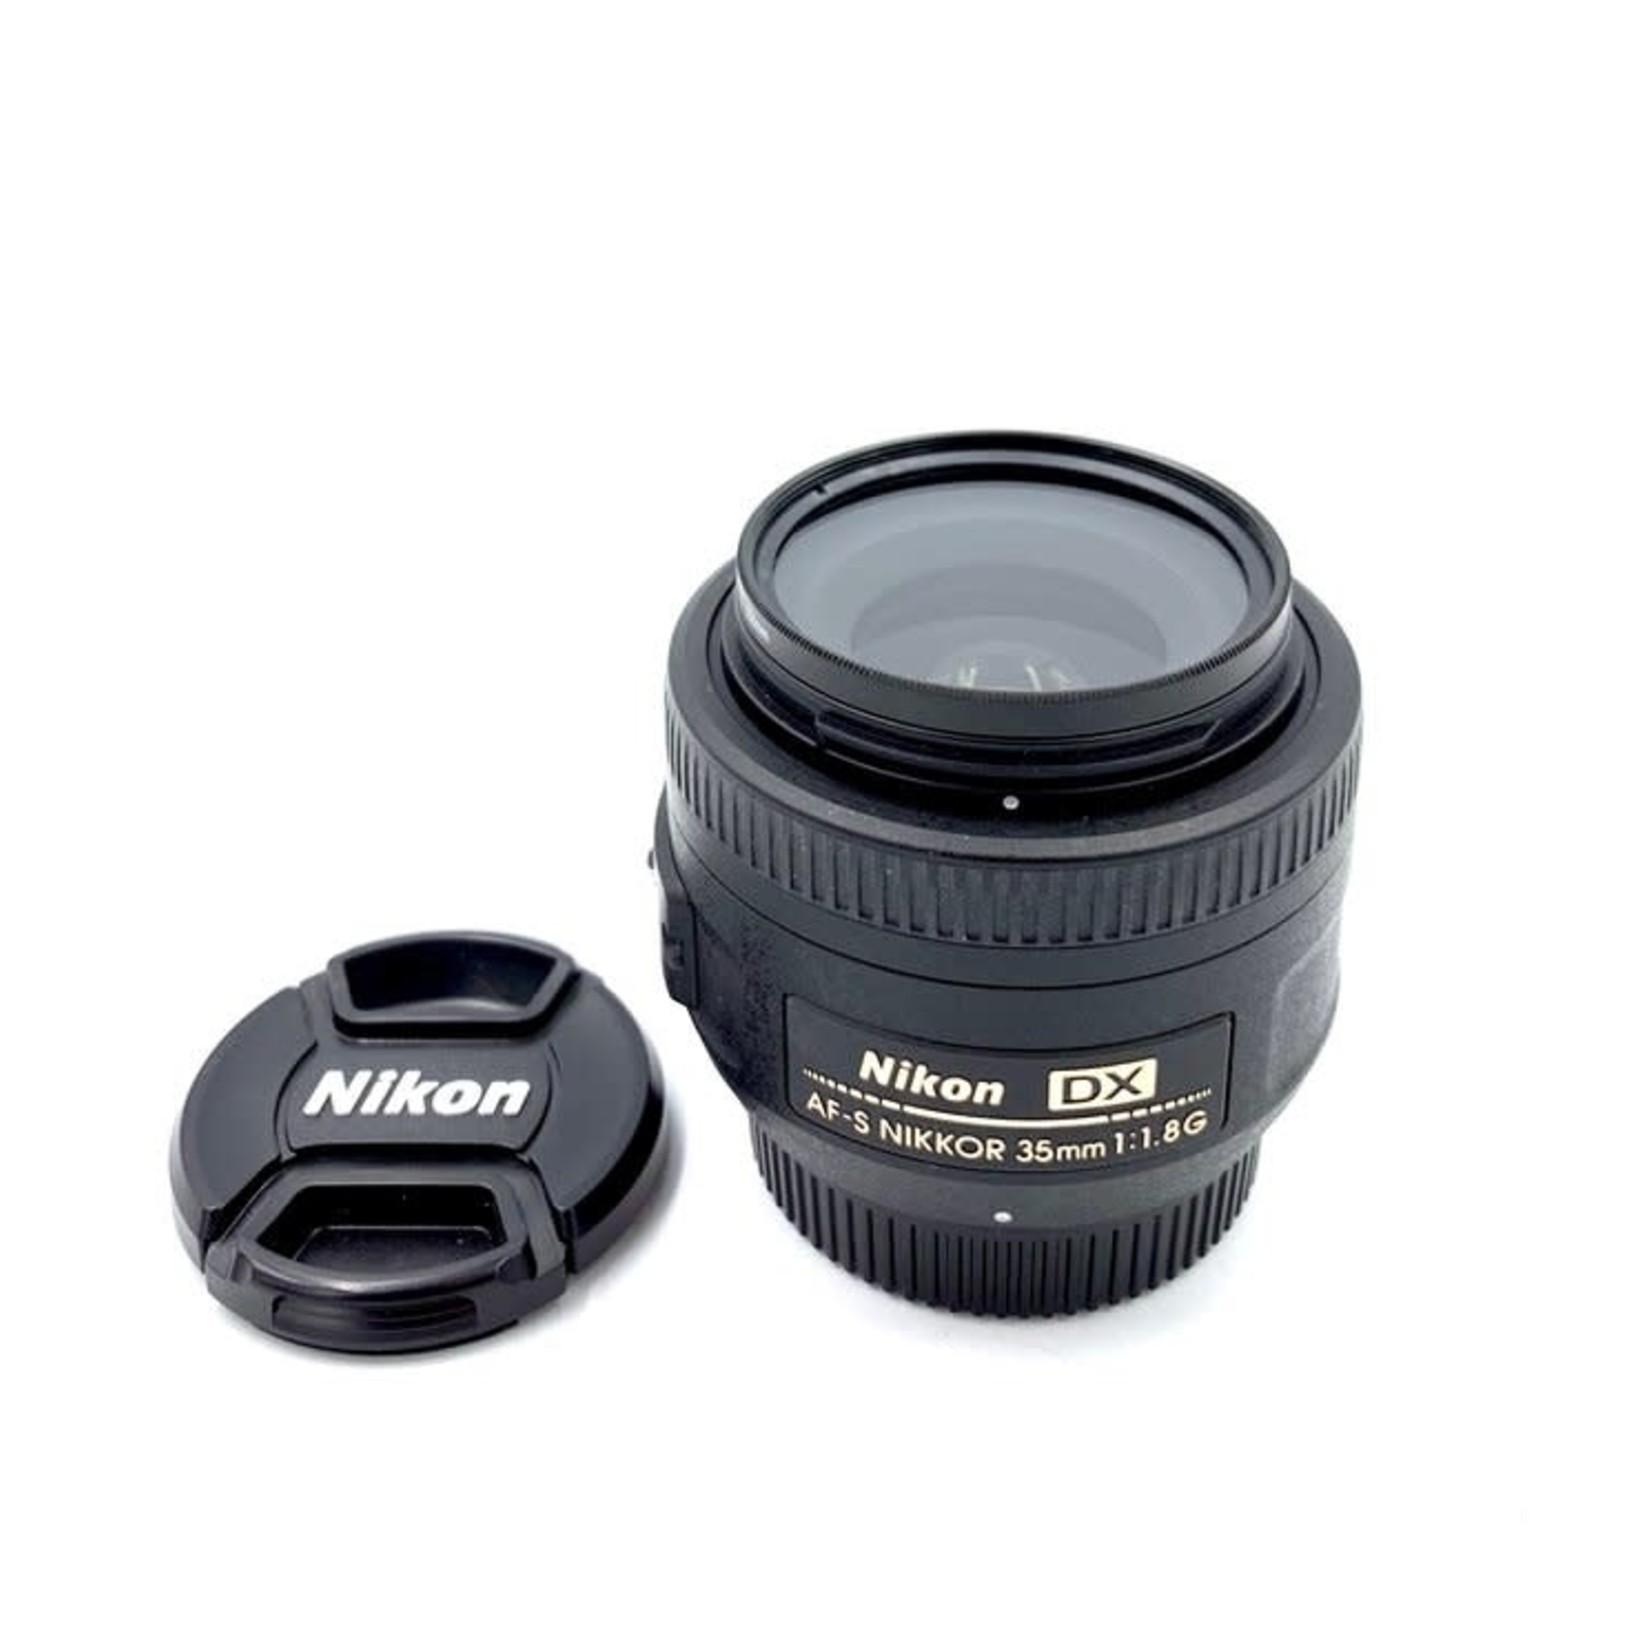 Nikon Used Nikon 35mm F1.8 DX